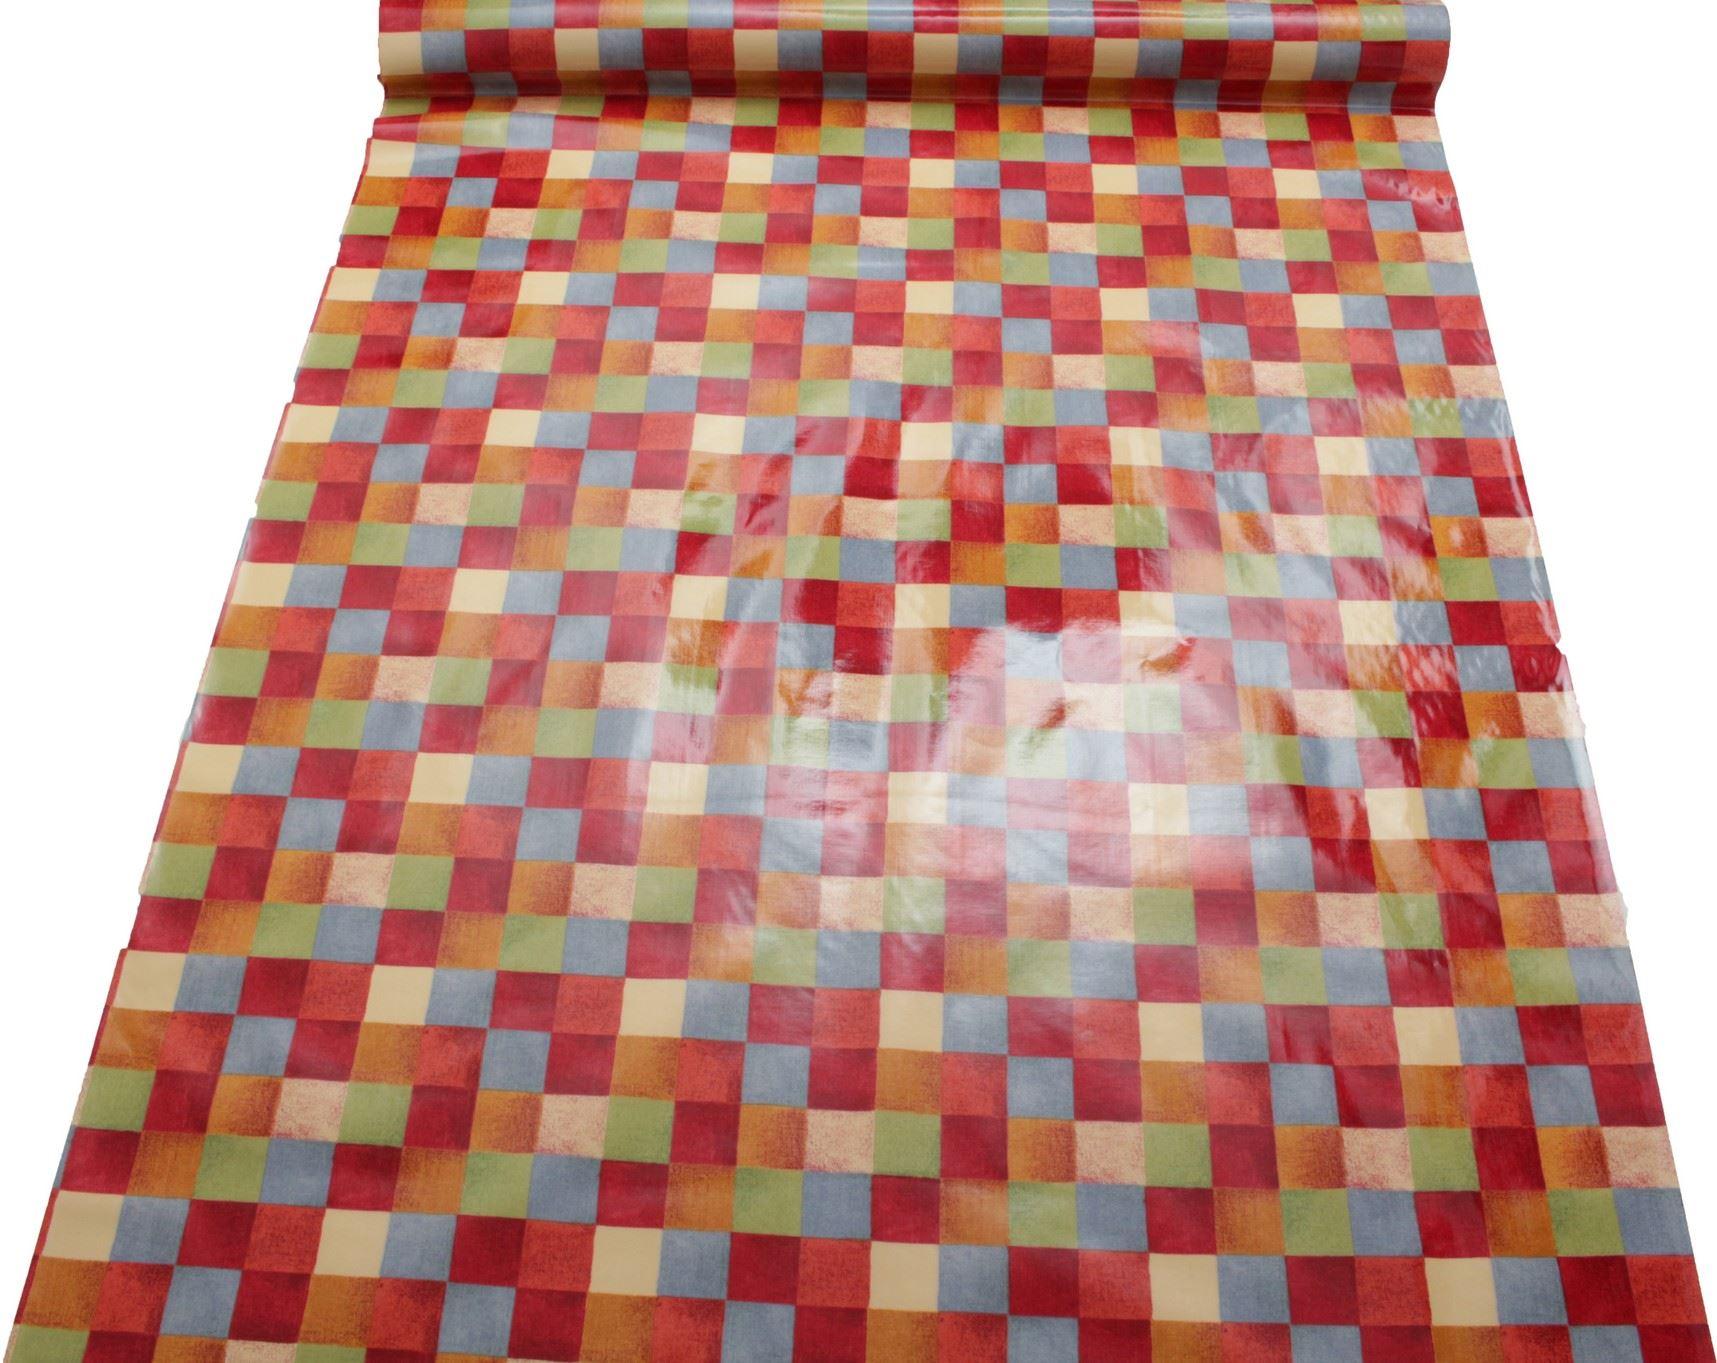 Tablecloth Fabric. Description A Collection of Tablecloth Fabrics 60